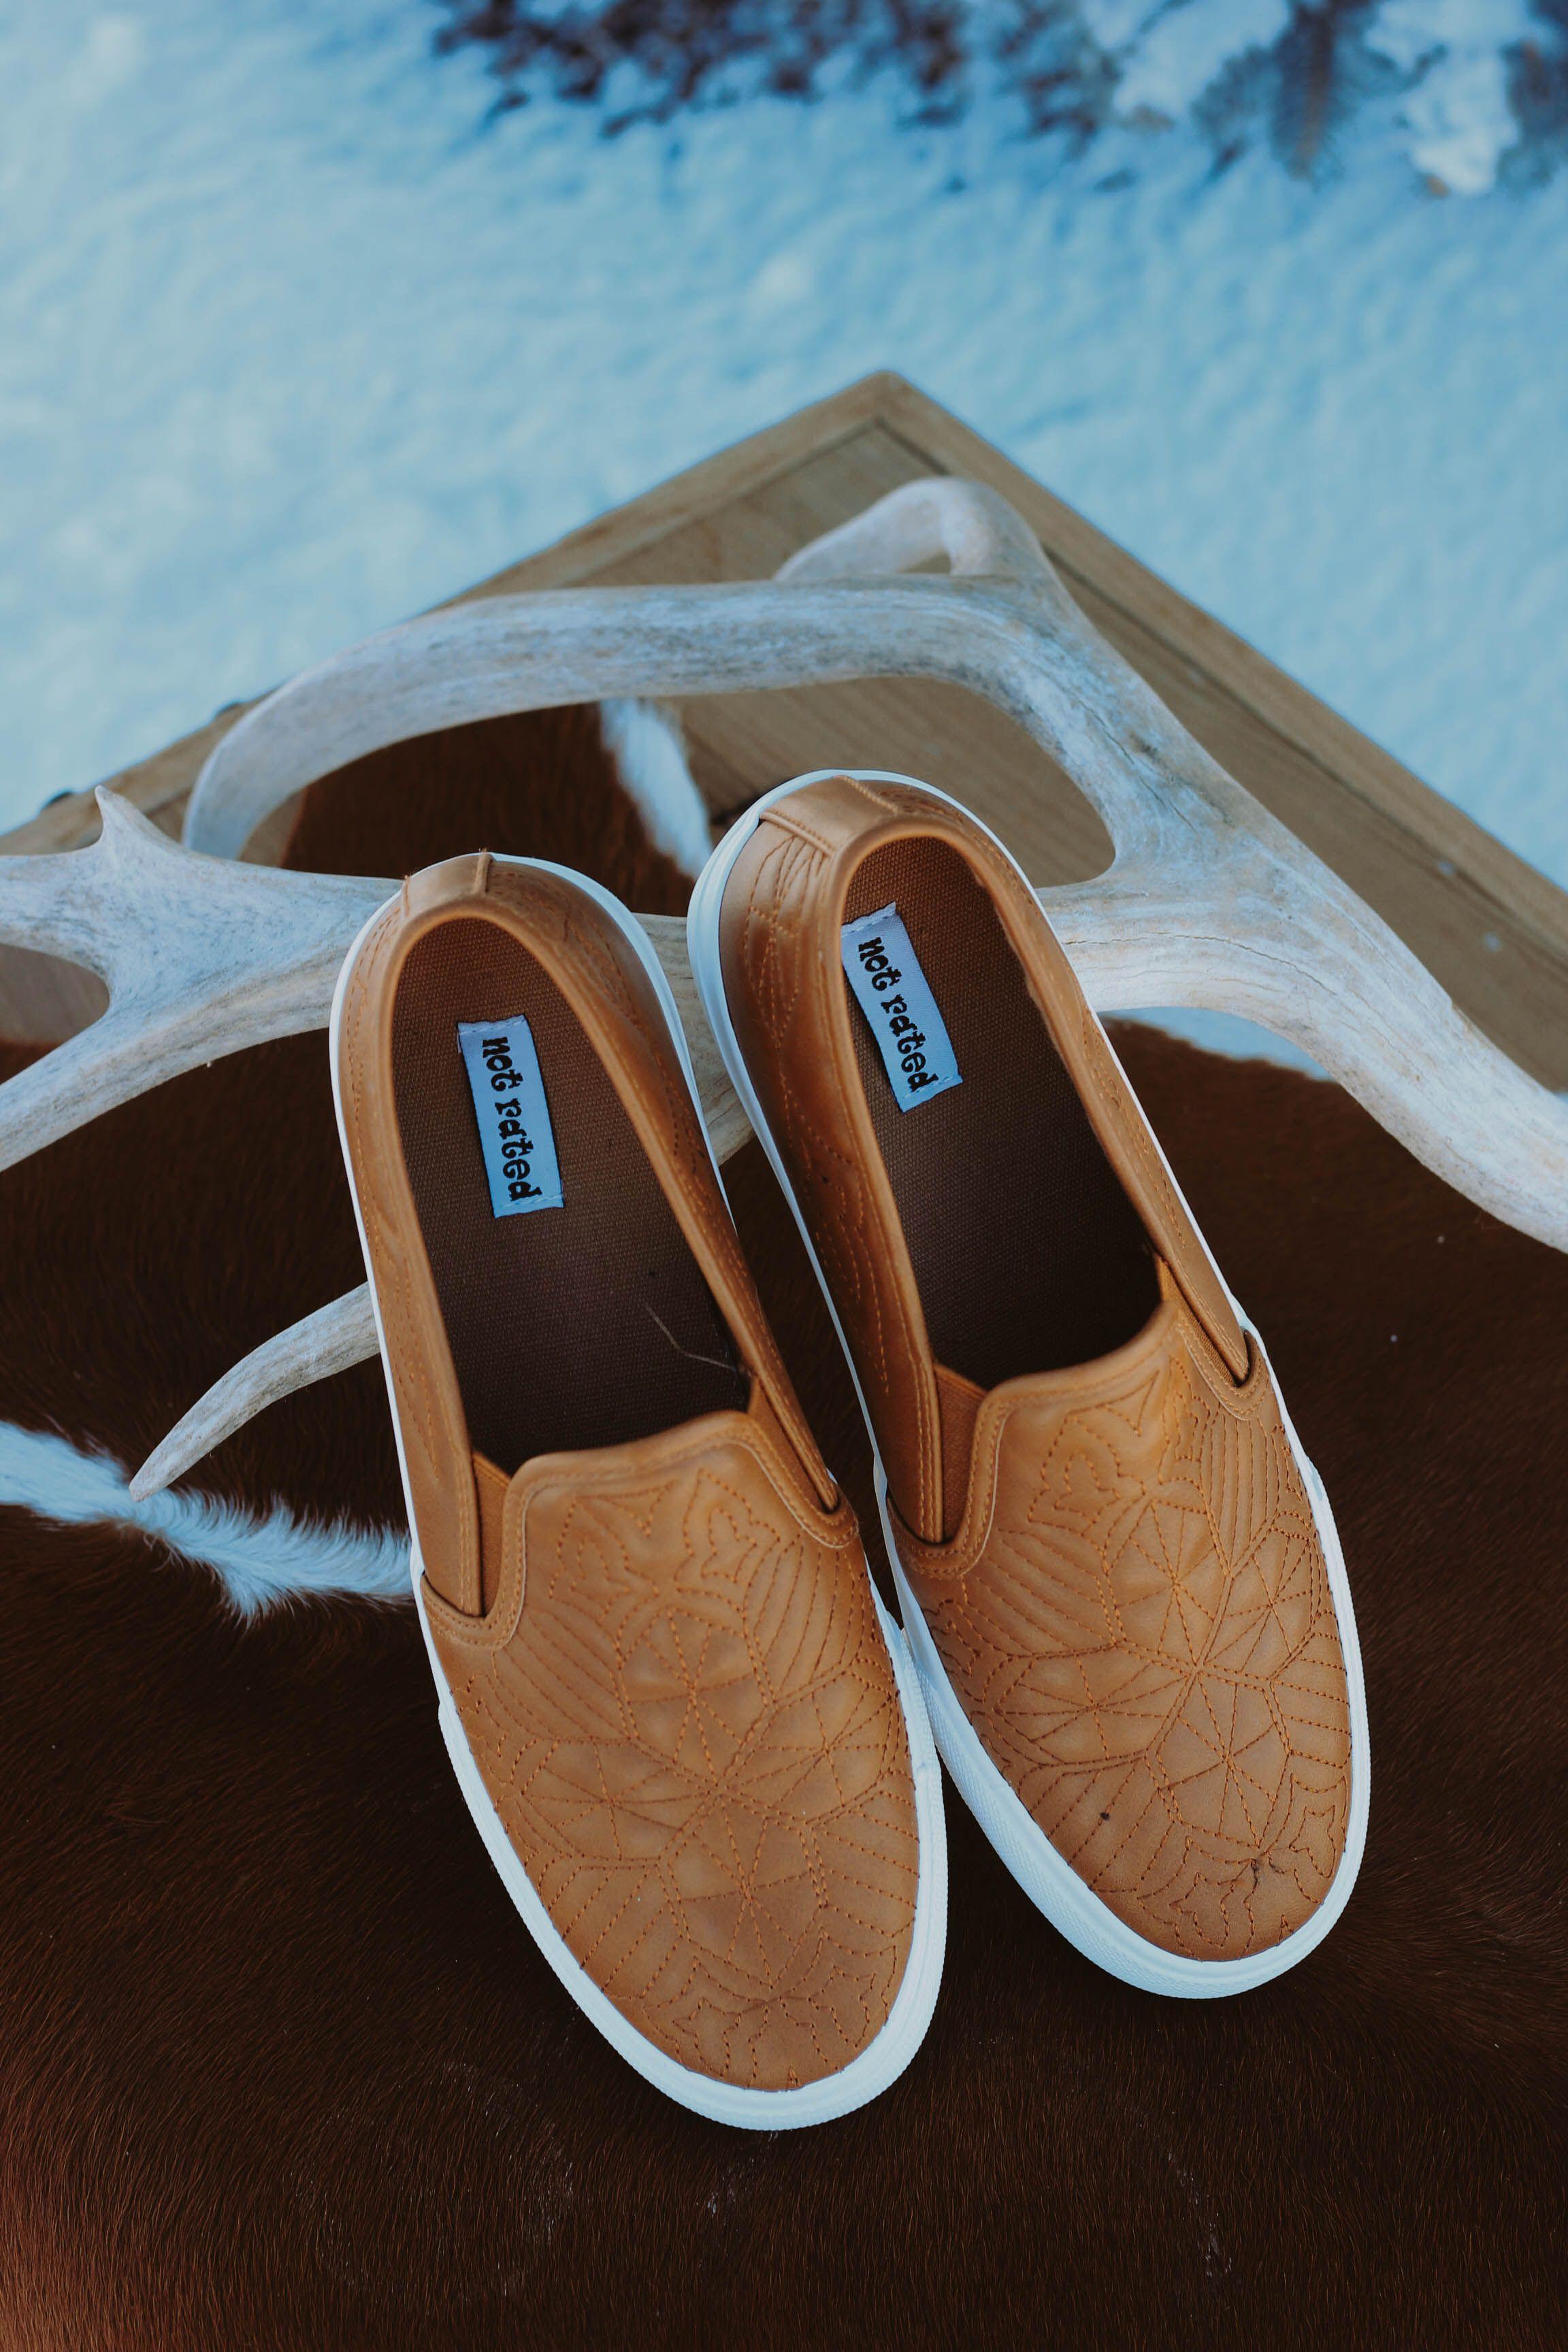 Sloan Sneakers by Not Rated Footwear